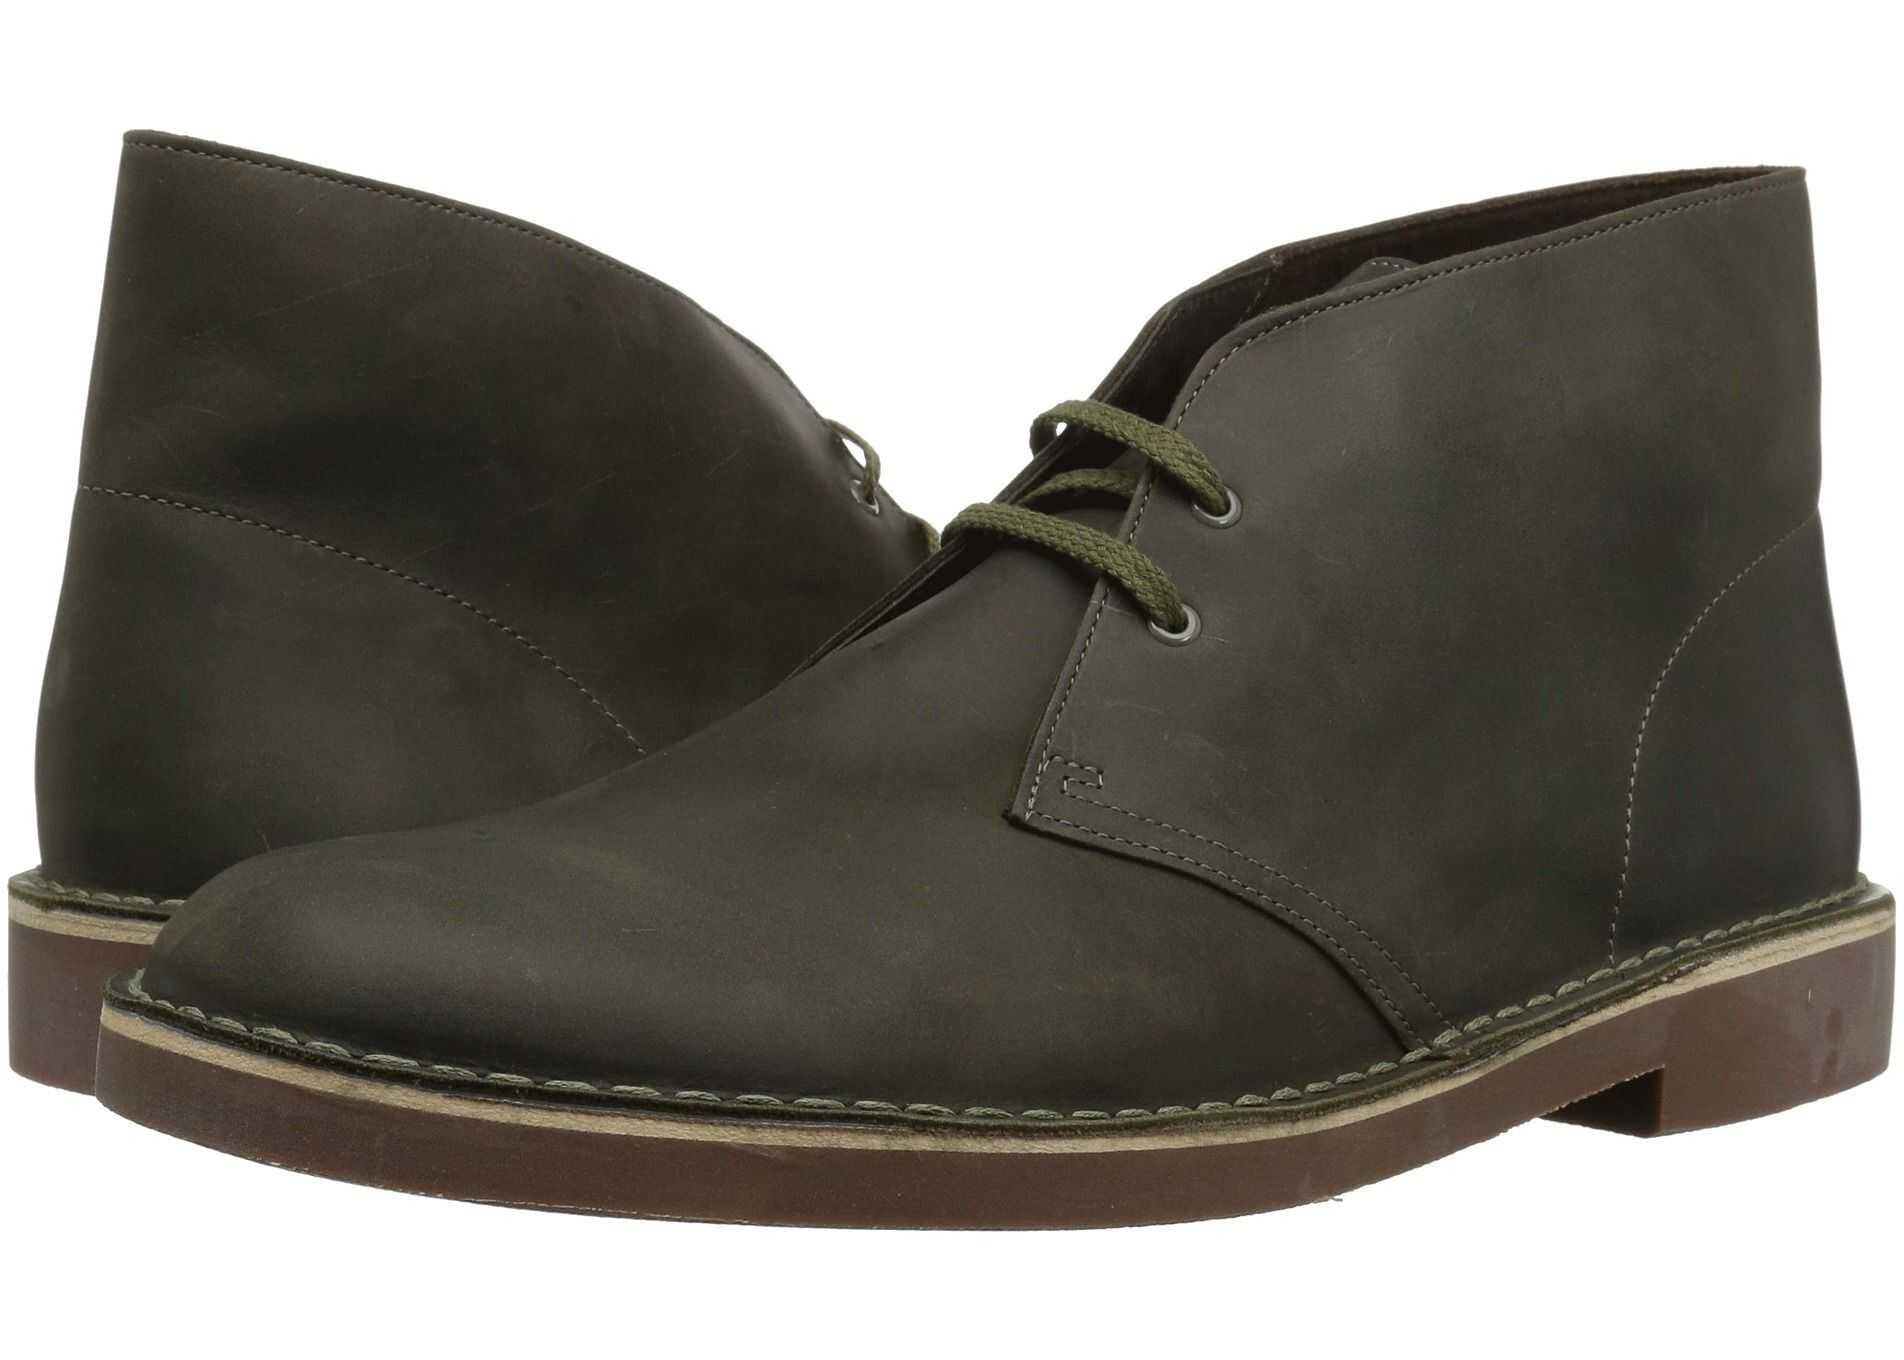 Clarks Bushacre 2 Dark Olive Leather